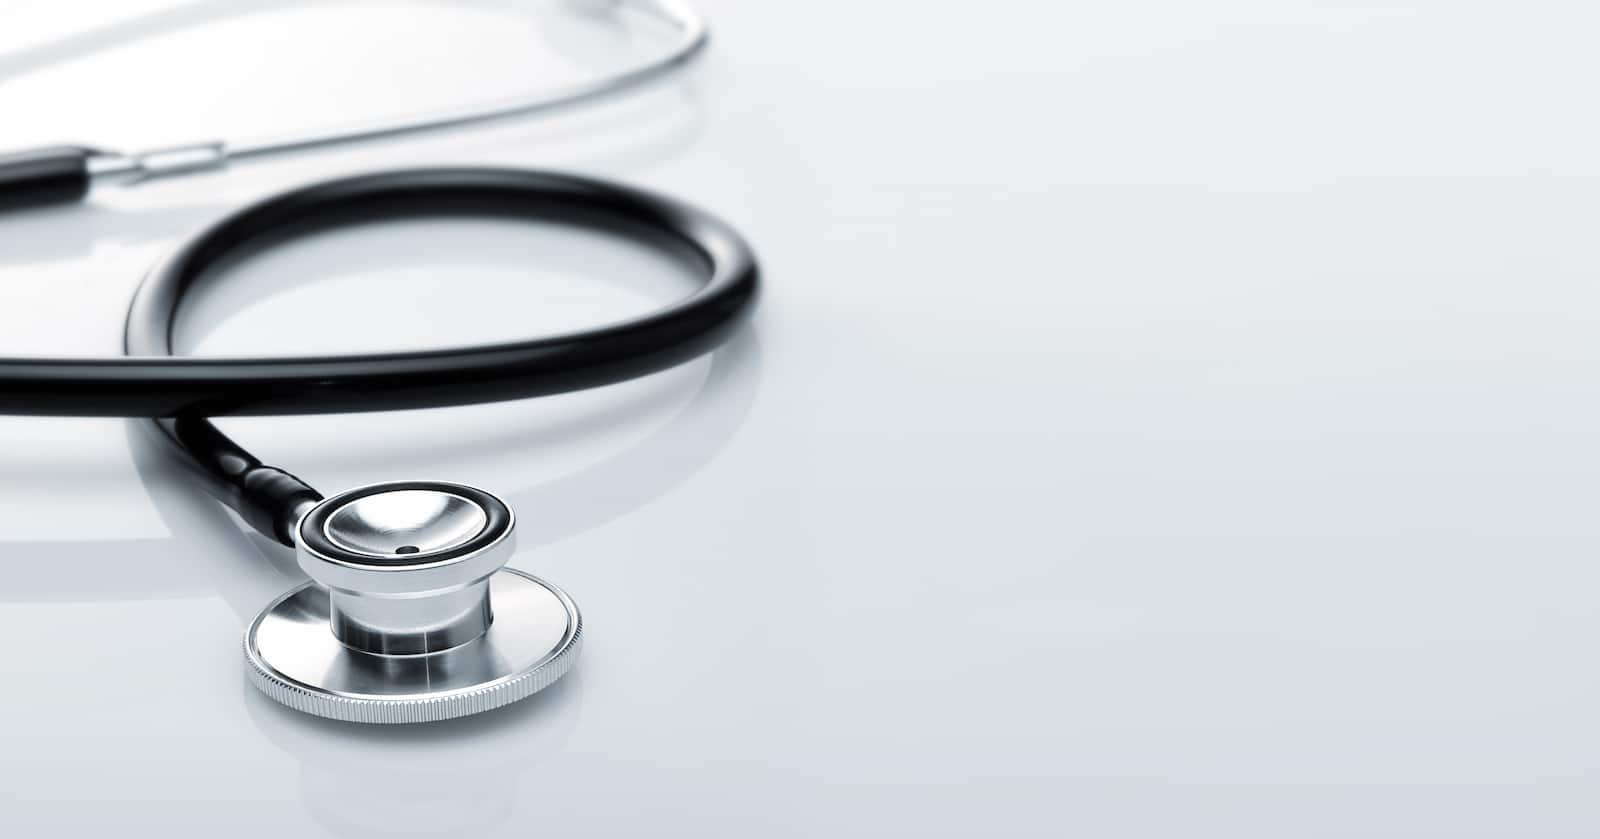 Life Insurance with No Medical Exam: How to Get a No-Exam Life Policy